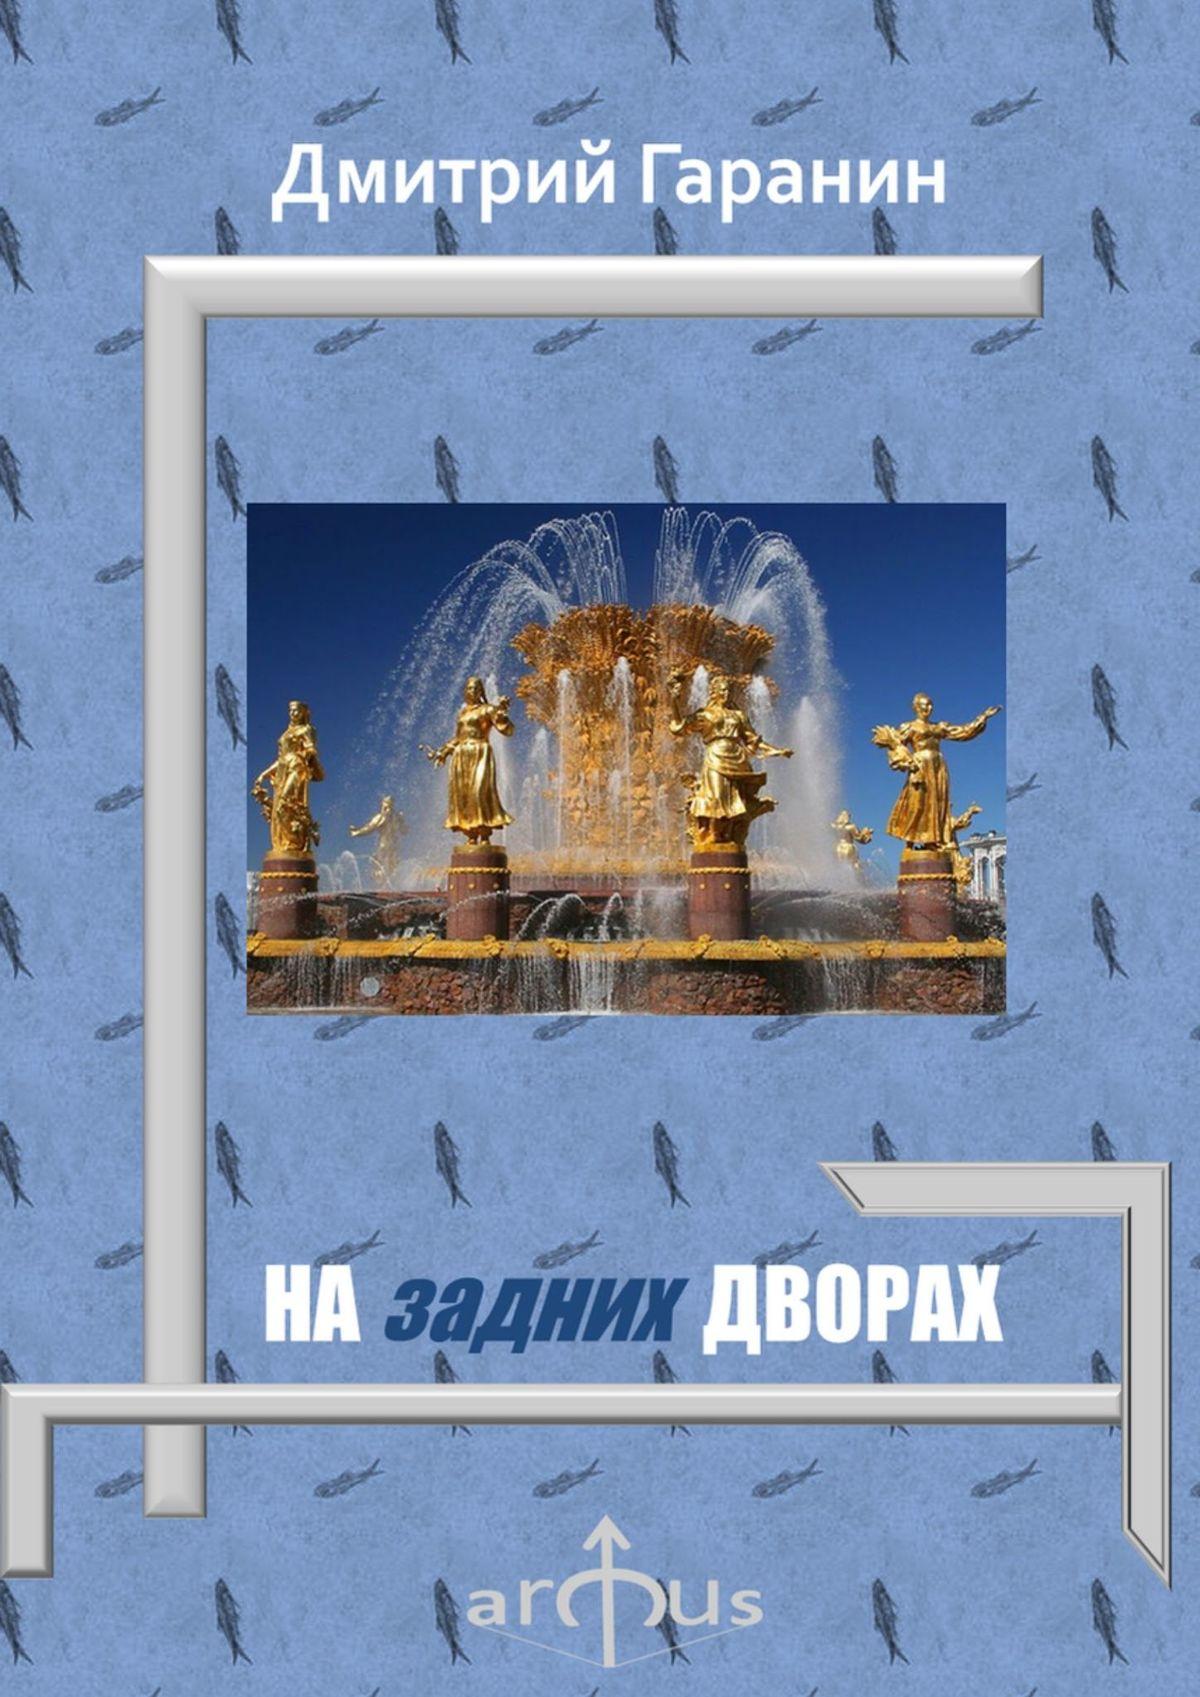 Дмитрий Гаранин На задних дворах. Проекции: №7